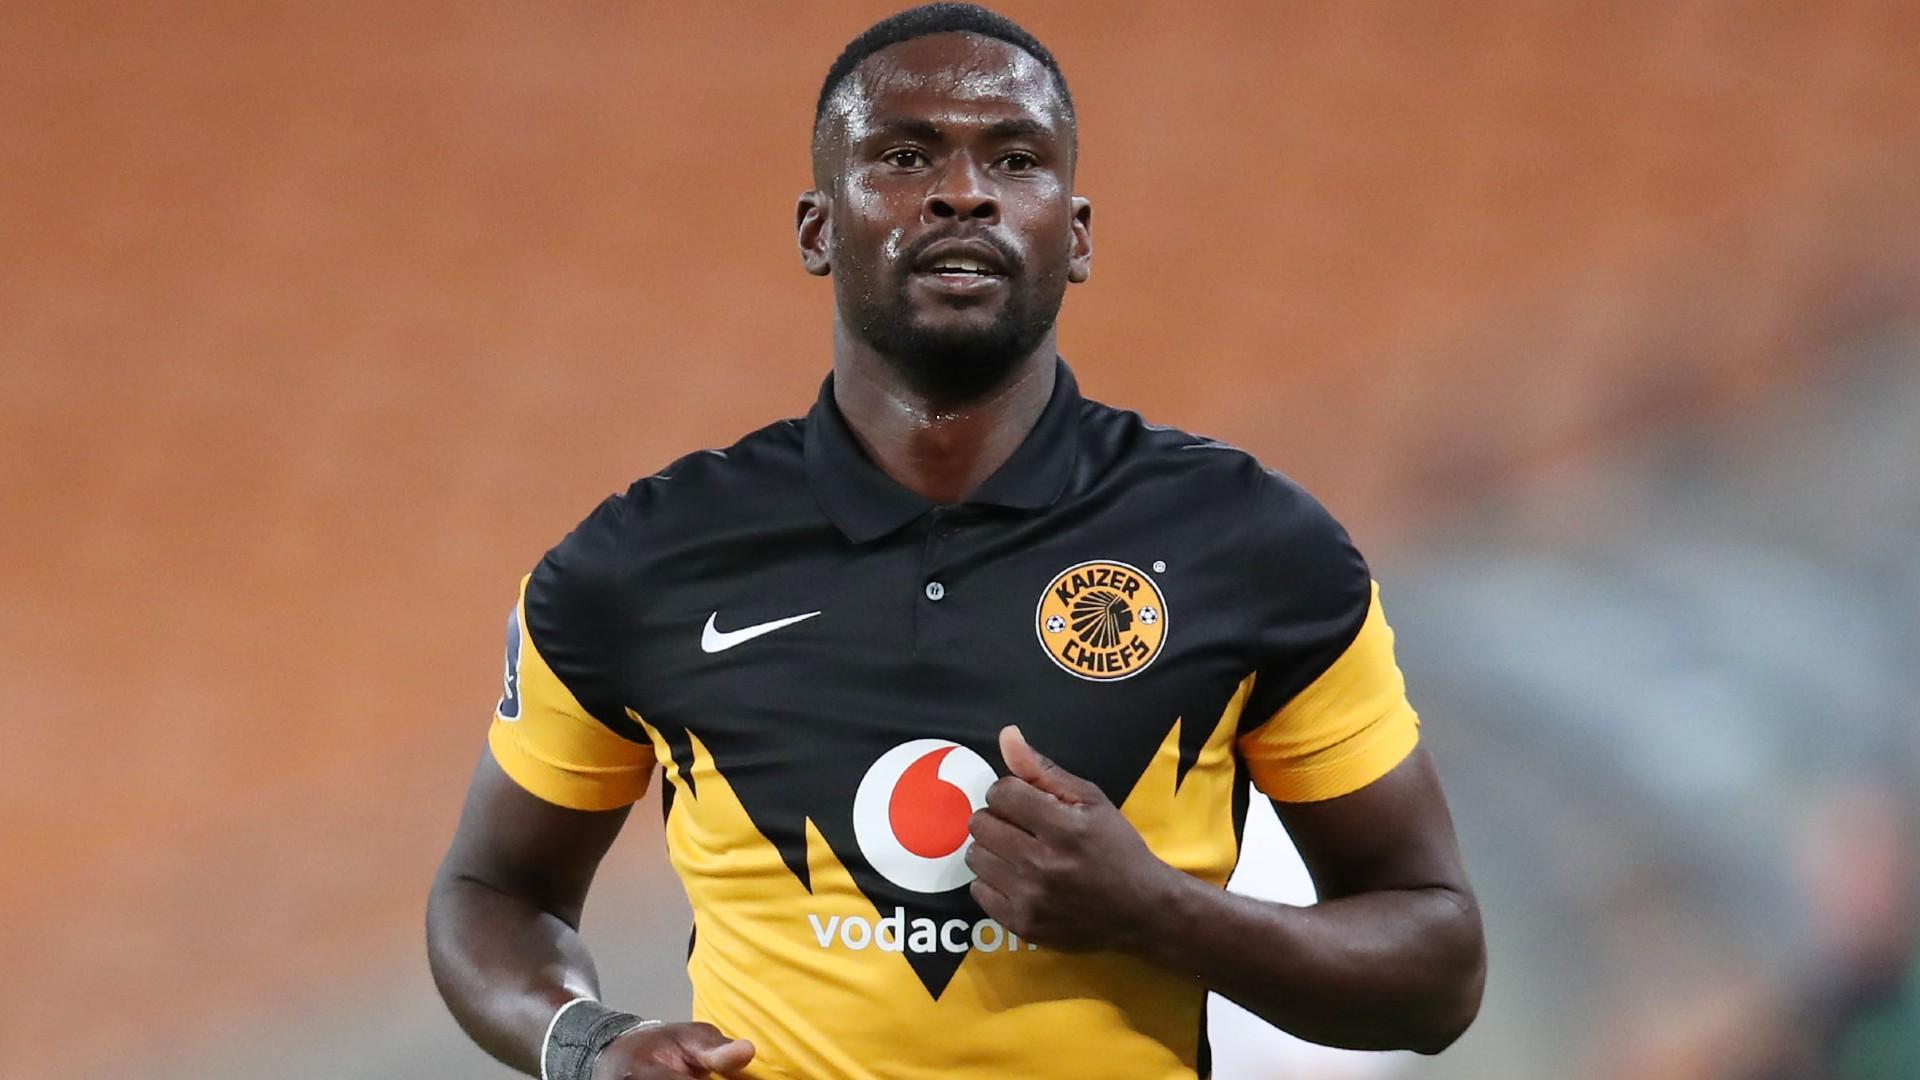 Moleko and Ekstein: AmaZulu sign former Kaizer Chiefs players